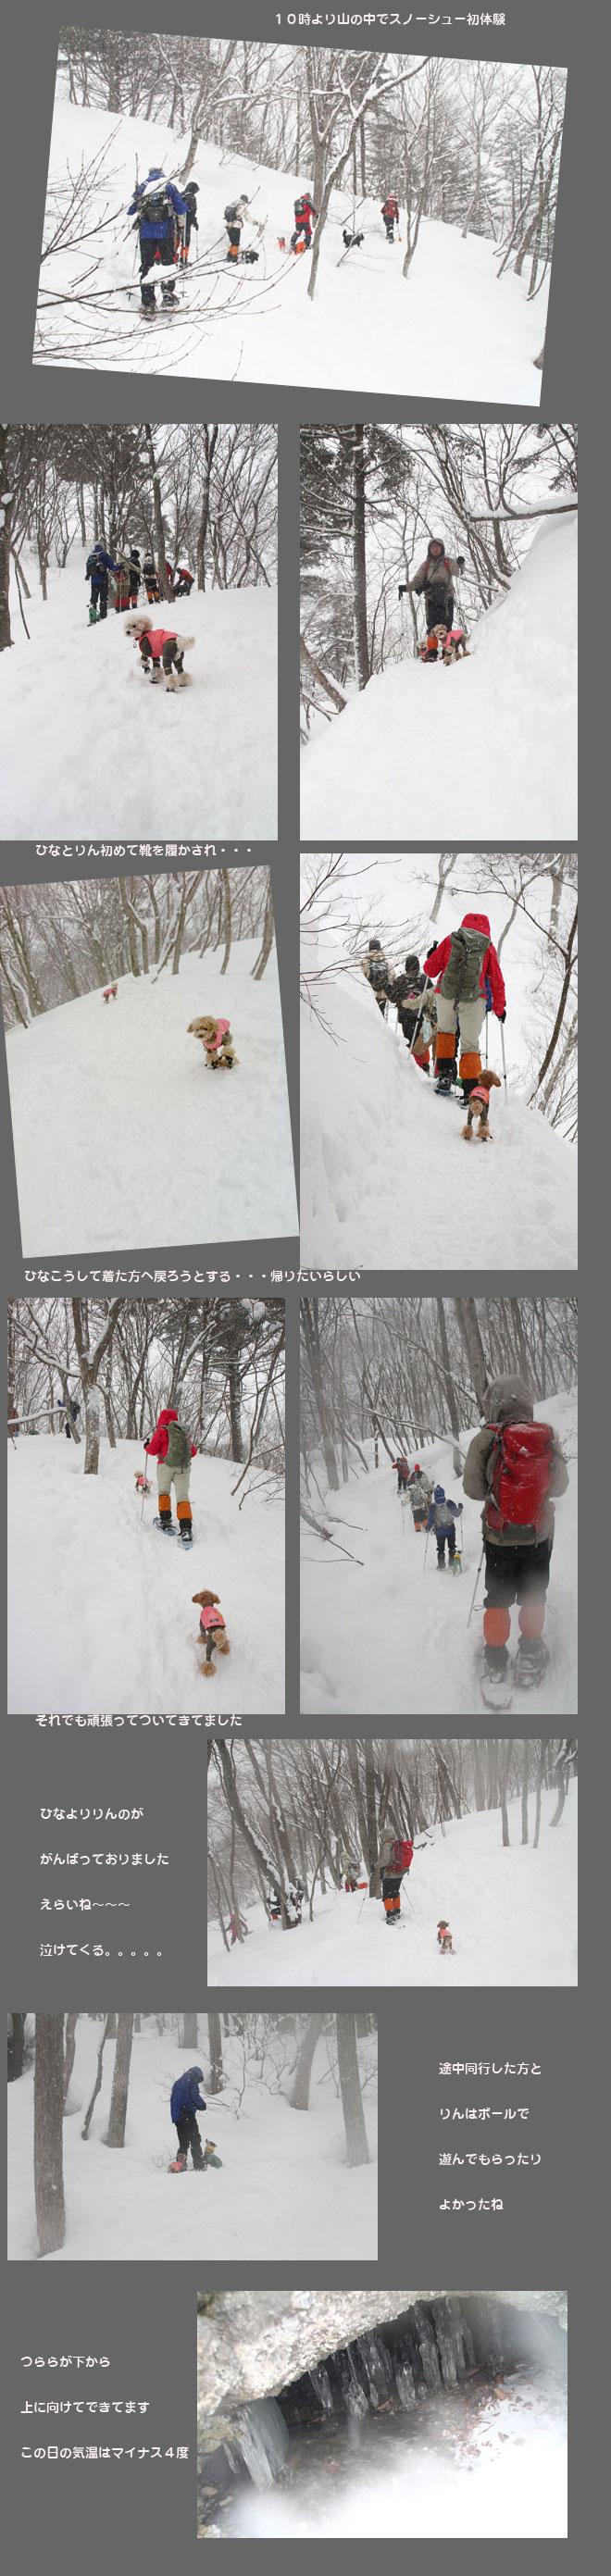 sunosyu-hhh.jpg